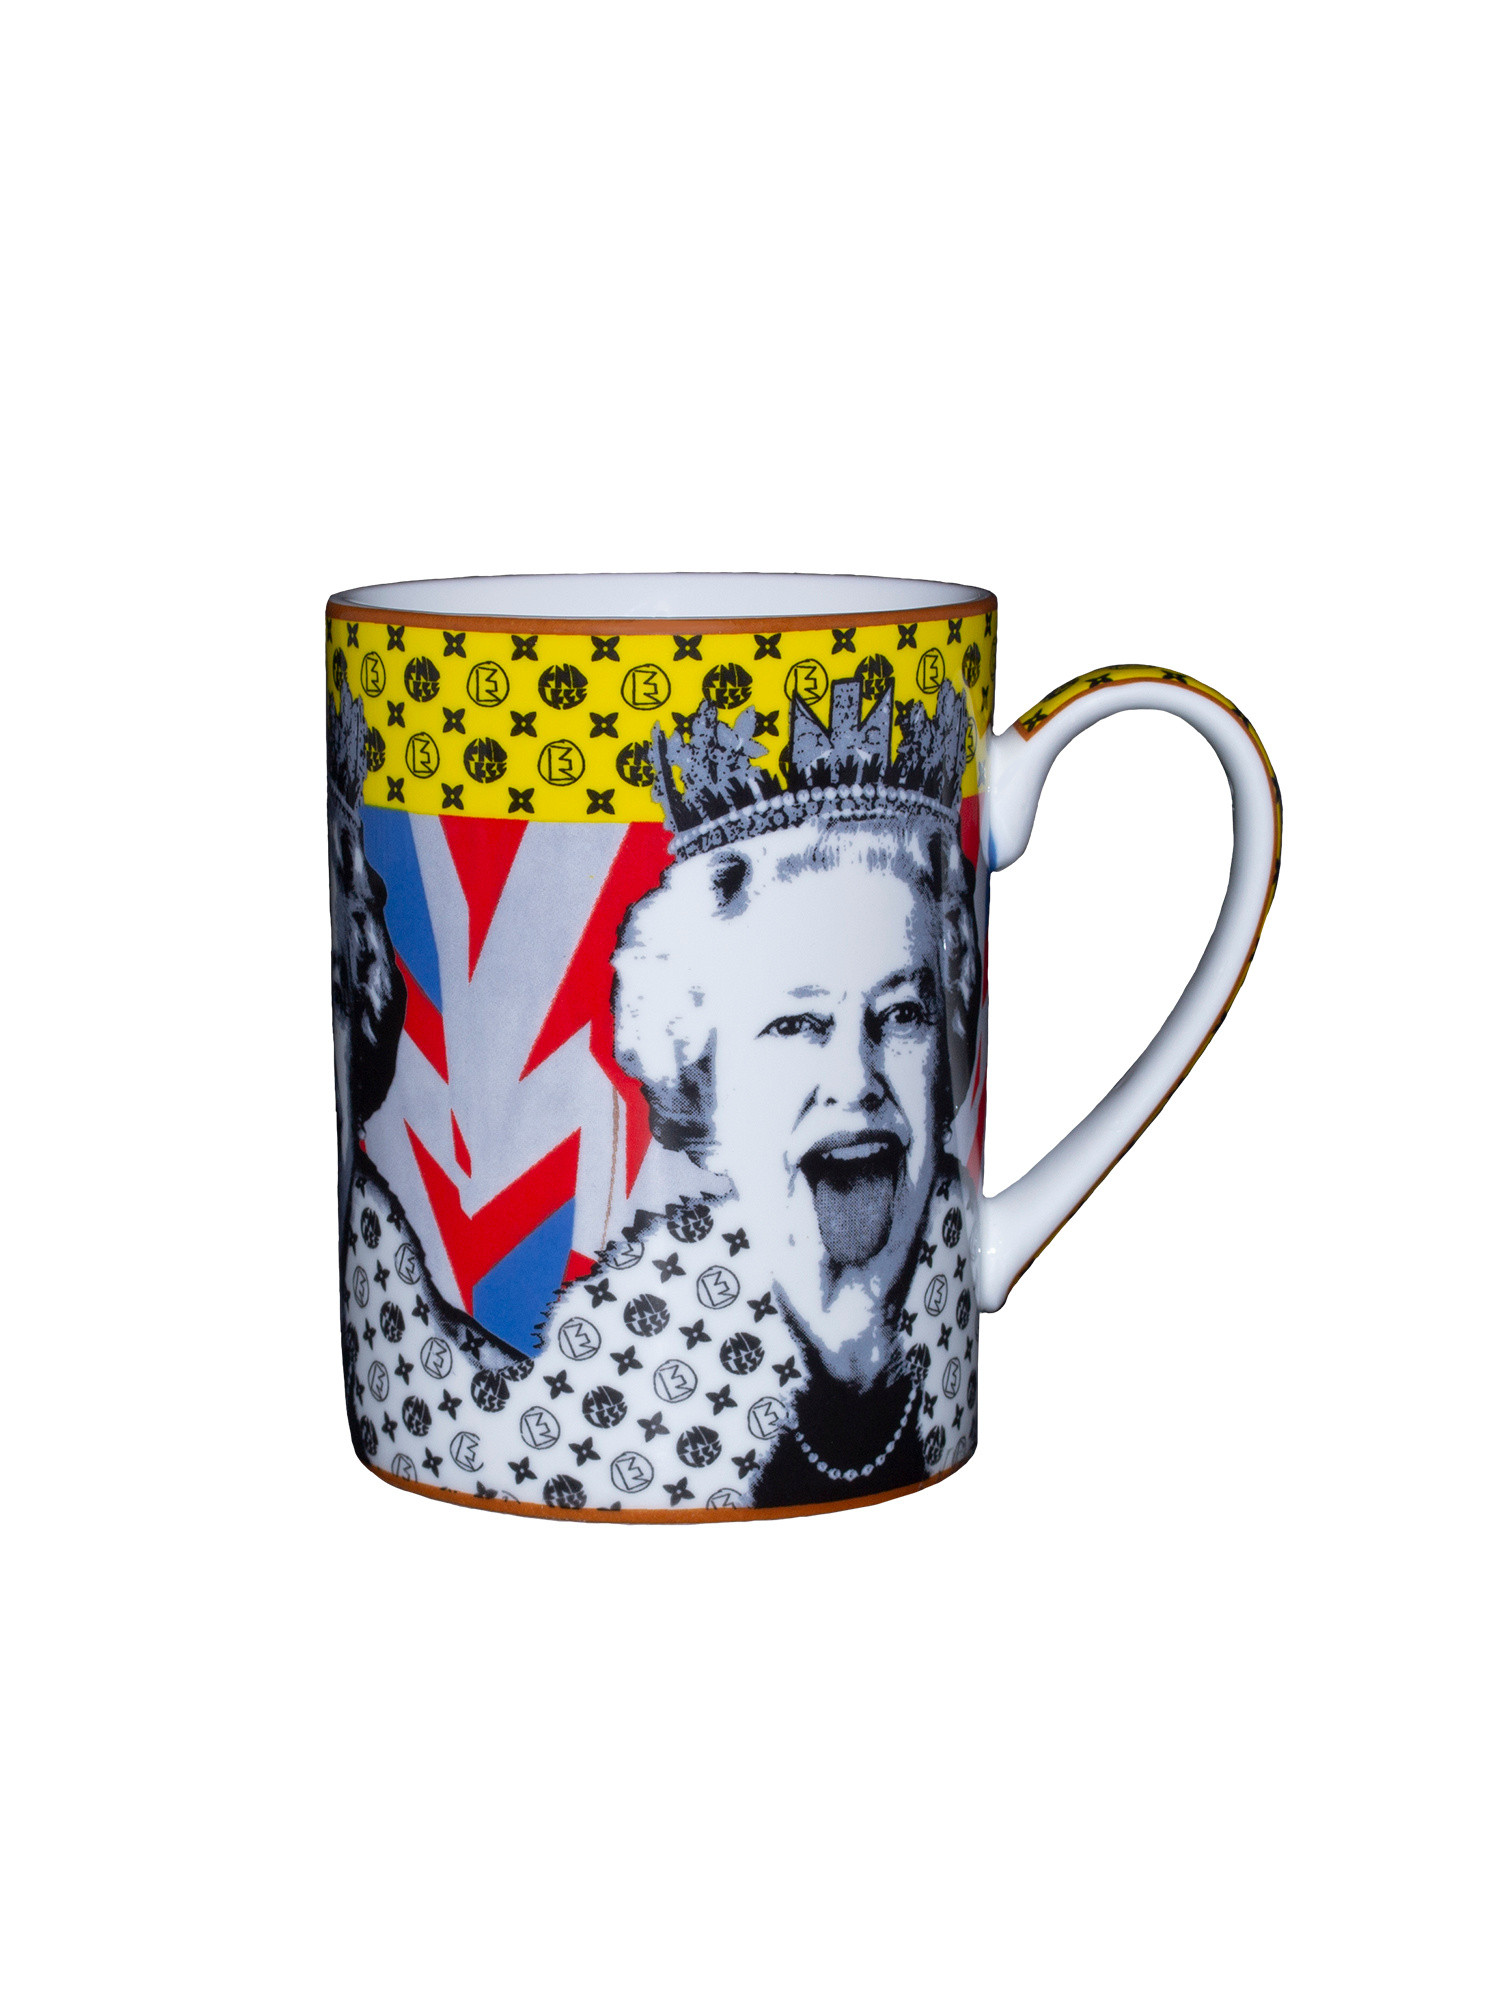 Mug design Lizzy Vuitton di Endless, Multicolor, large image number 0